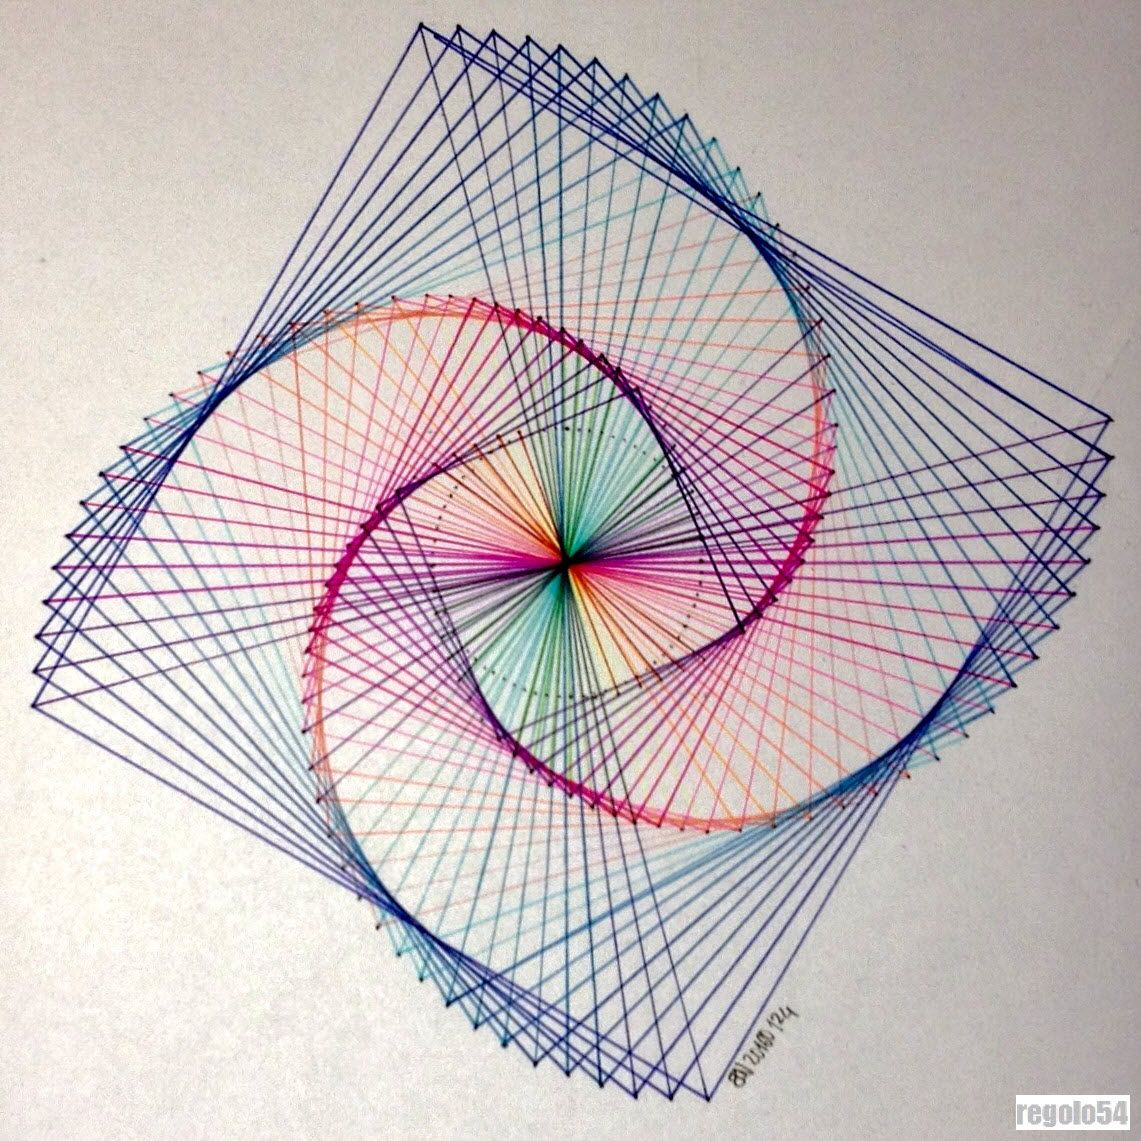 String Art: New Post On Regolo54